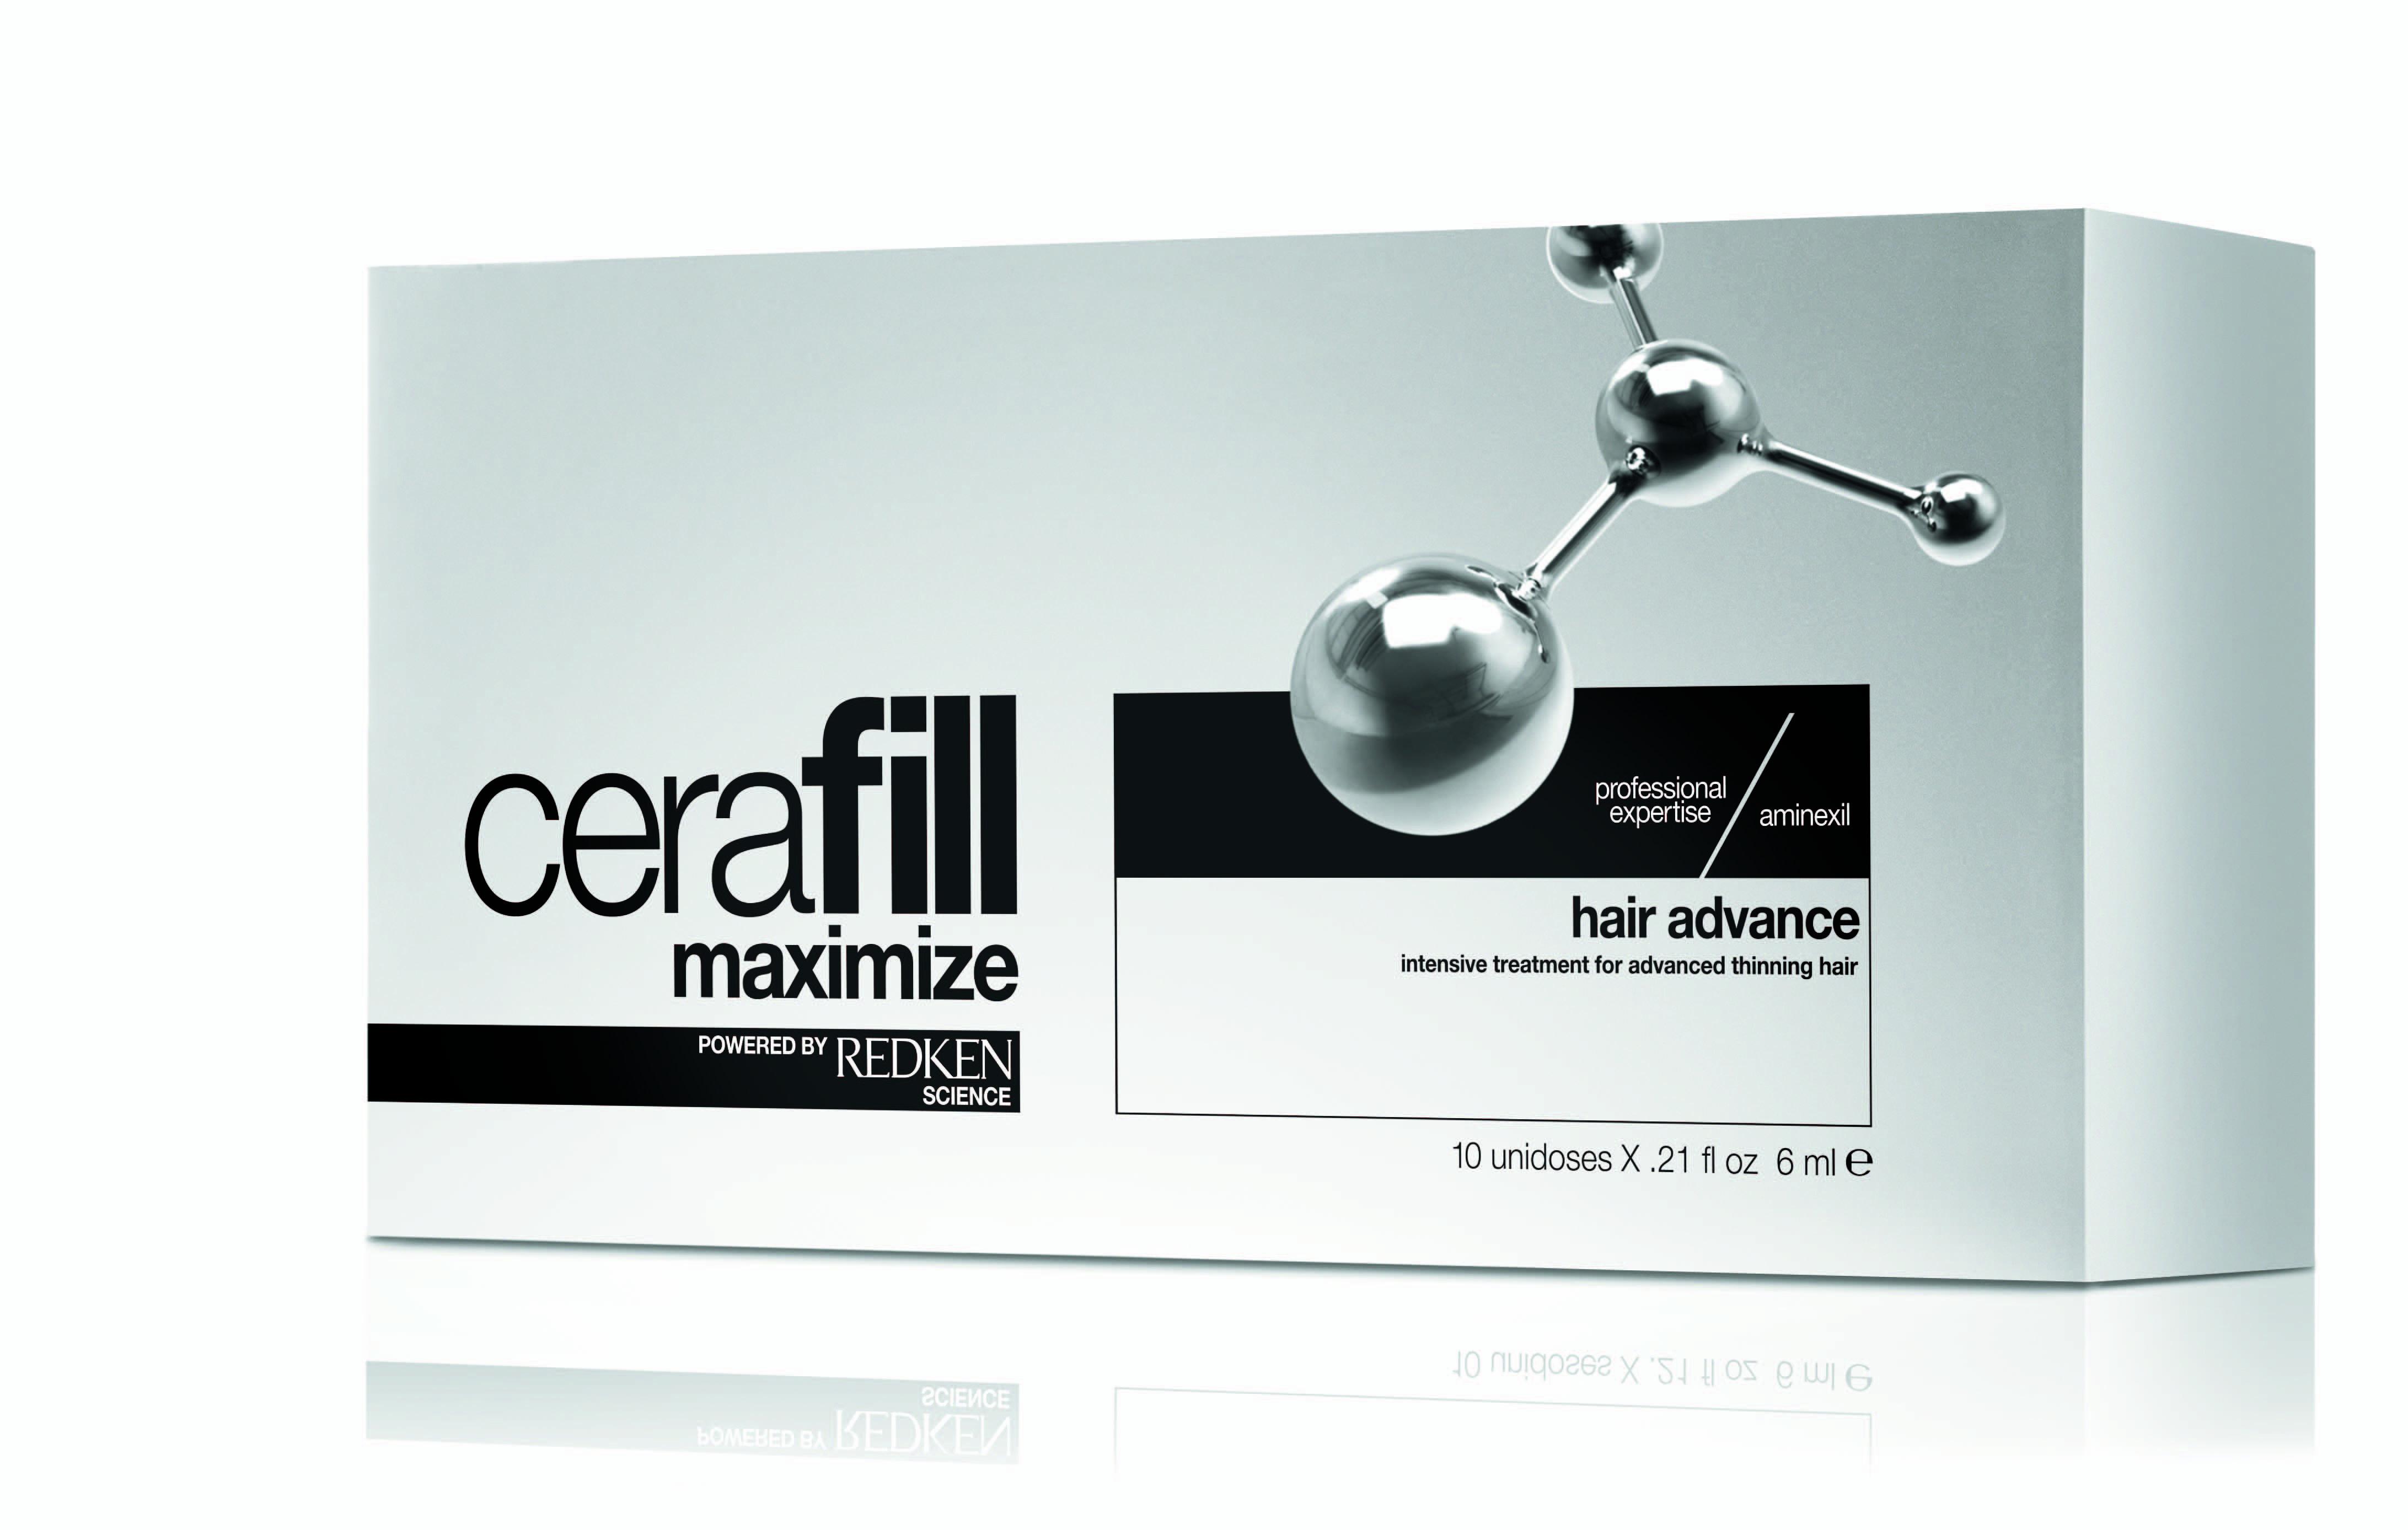 REDKEN CERAFILL MAXIMIZE HAIR ADVANCED 6MLX10 CC